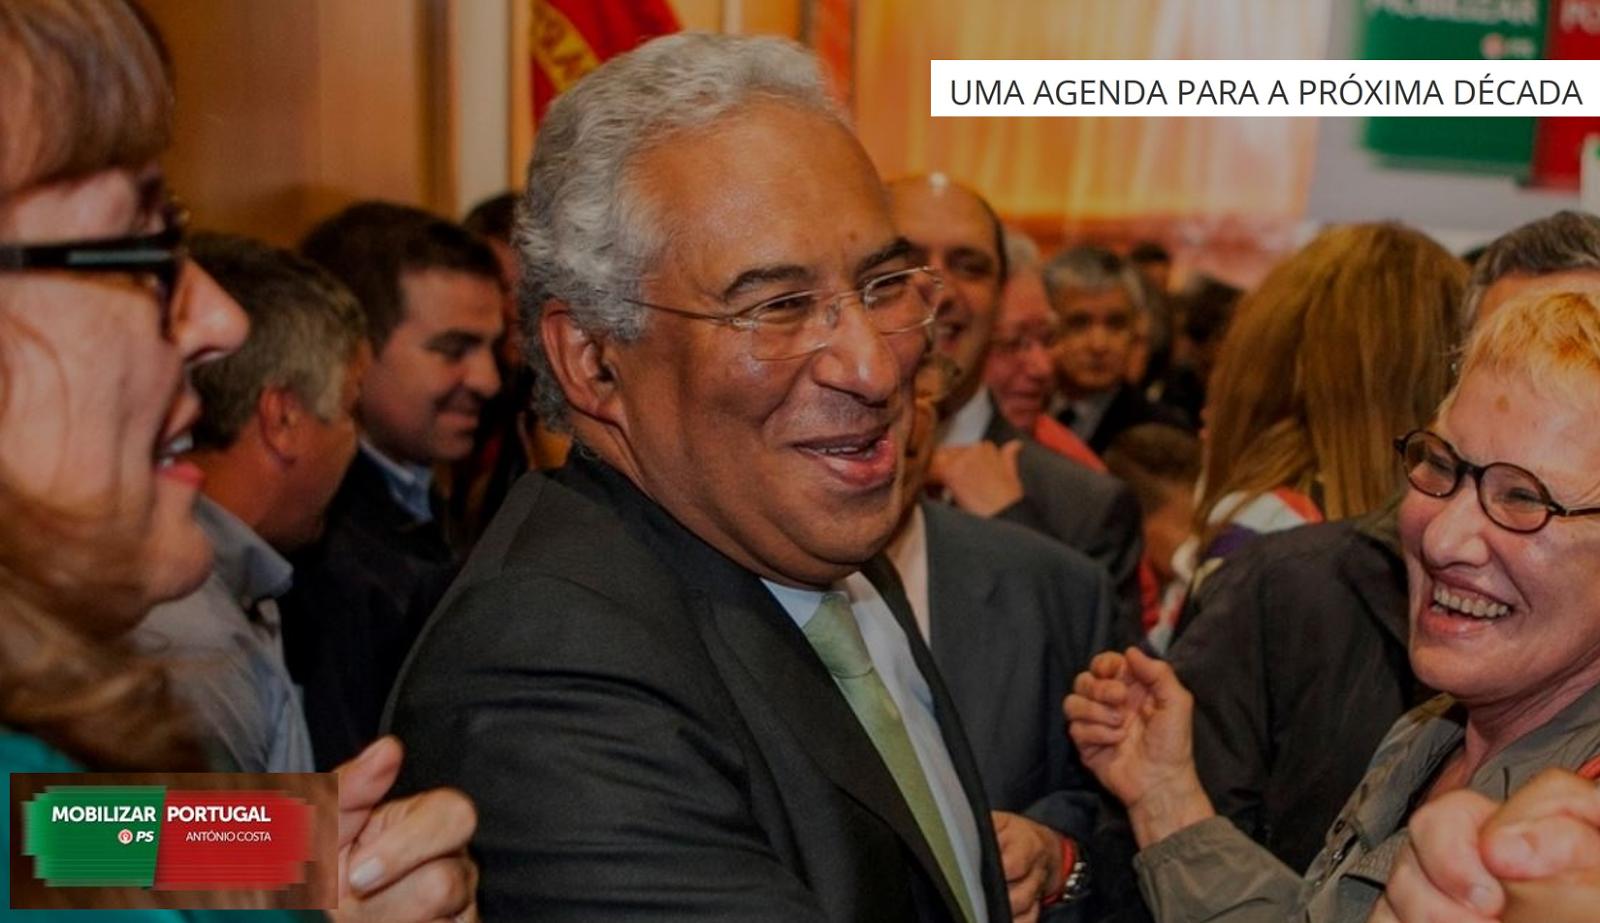 http://www.mobilizarportugal.pt/agenda/